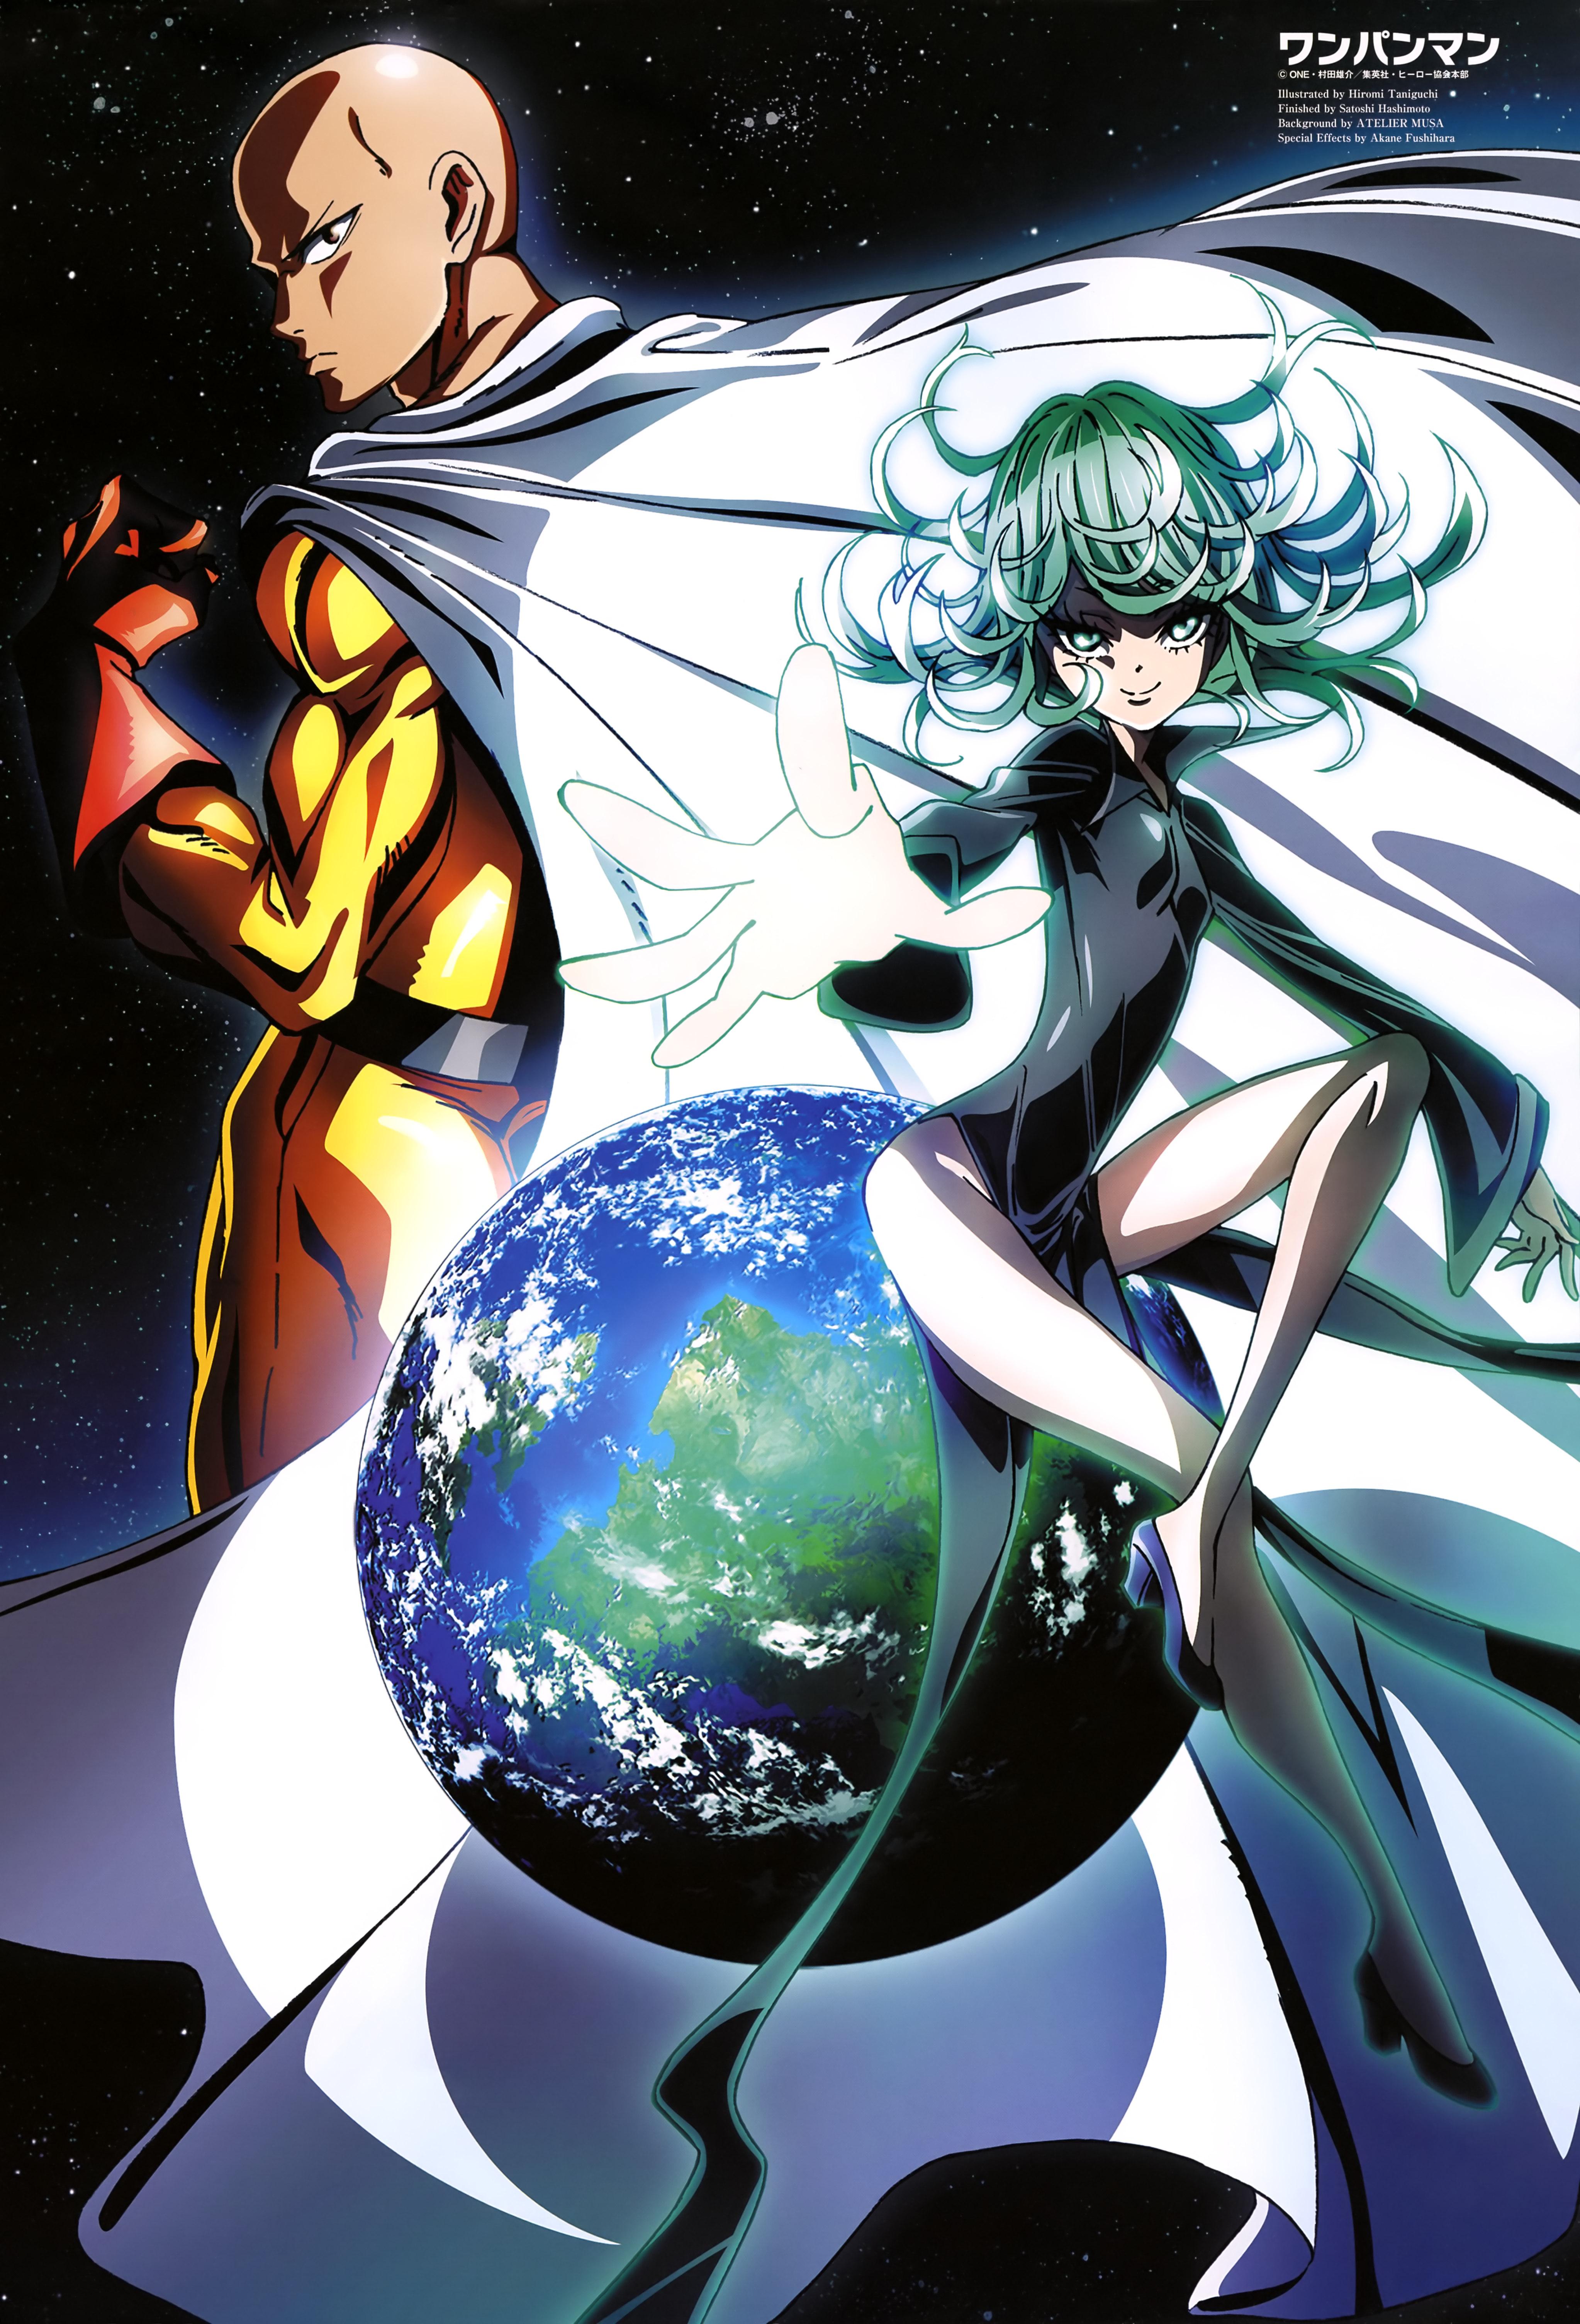 Fascinating Saitama and Tatsumaki Poster Revealed